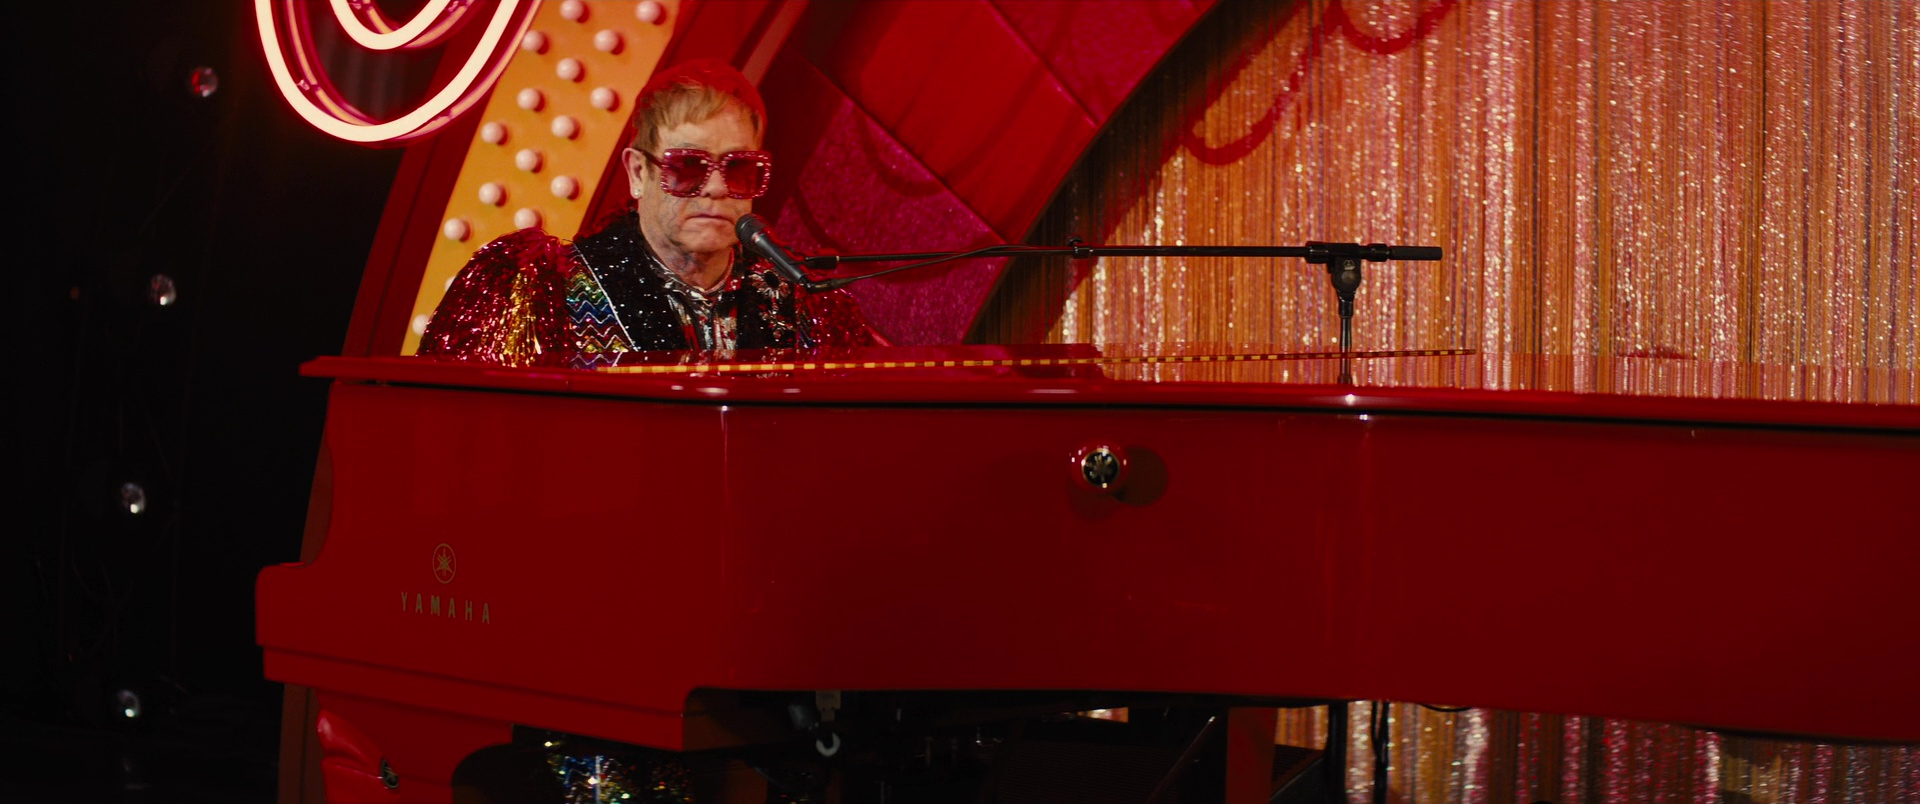 Yamaha Red Grand Piano